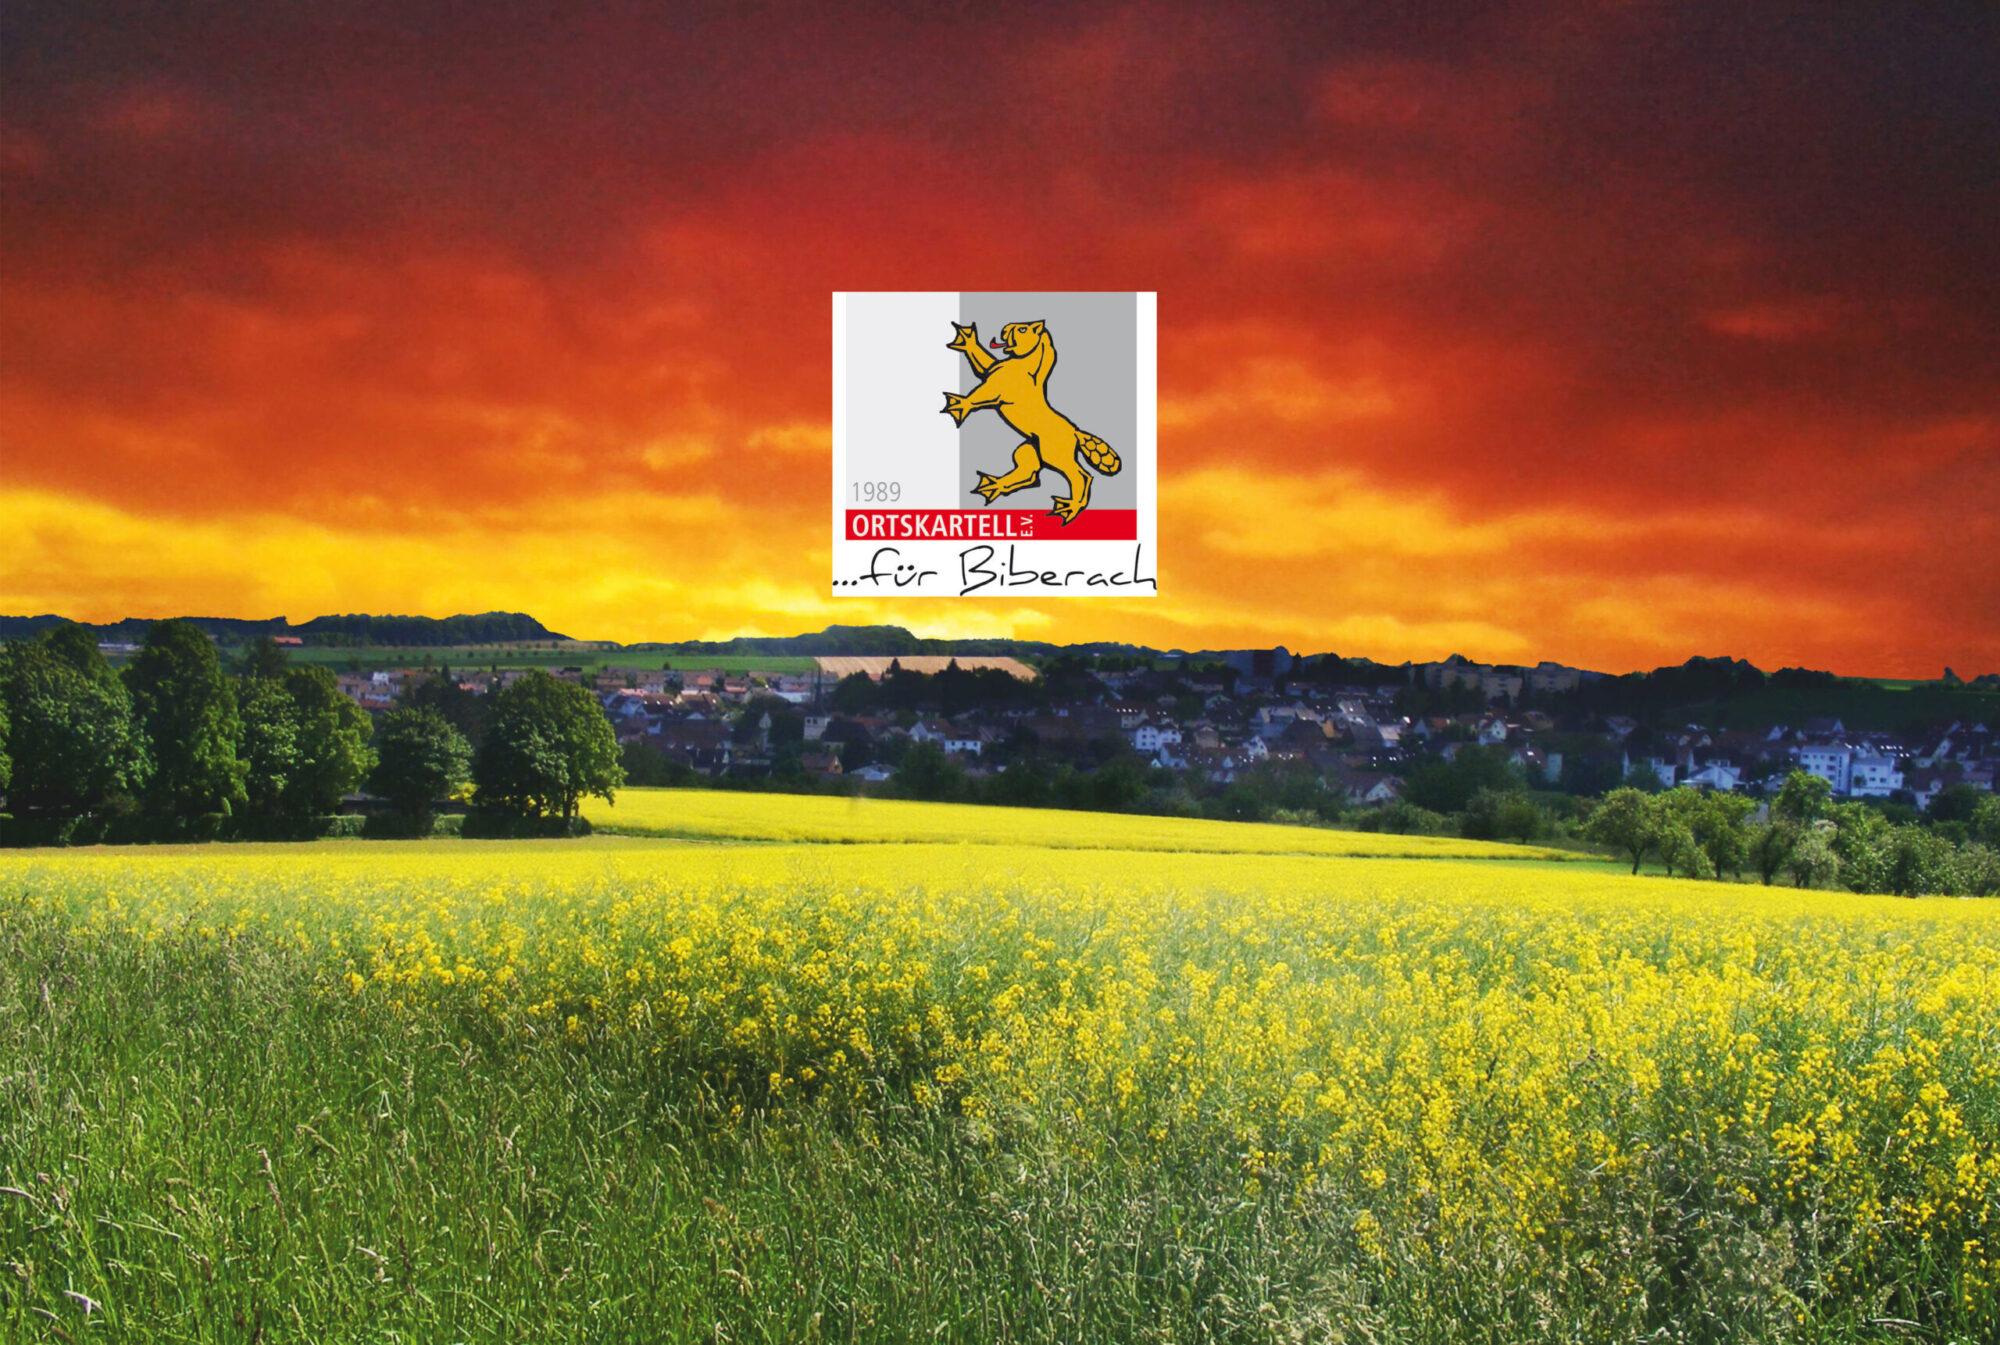 Ortskartell Heilbronn-Biberach